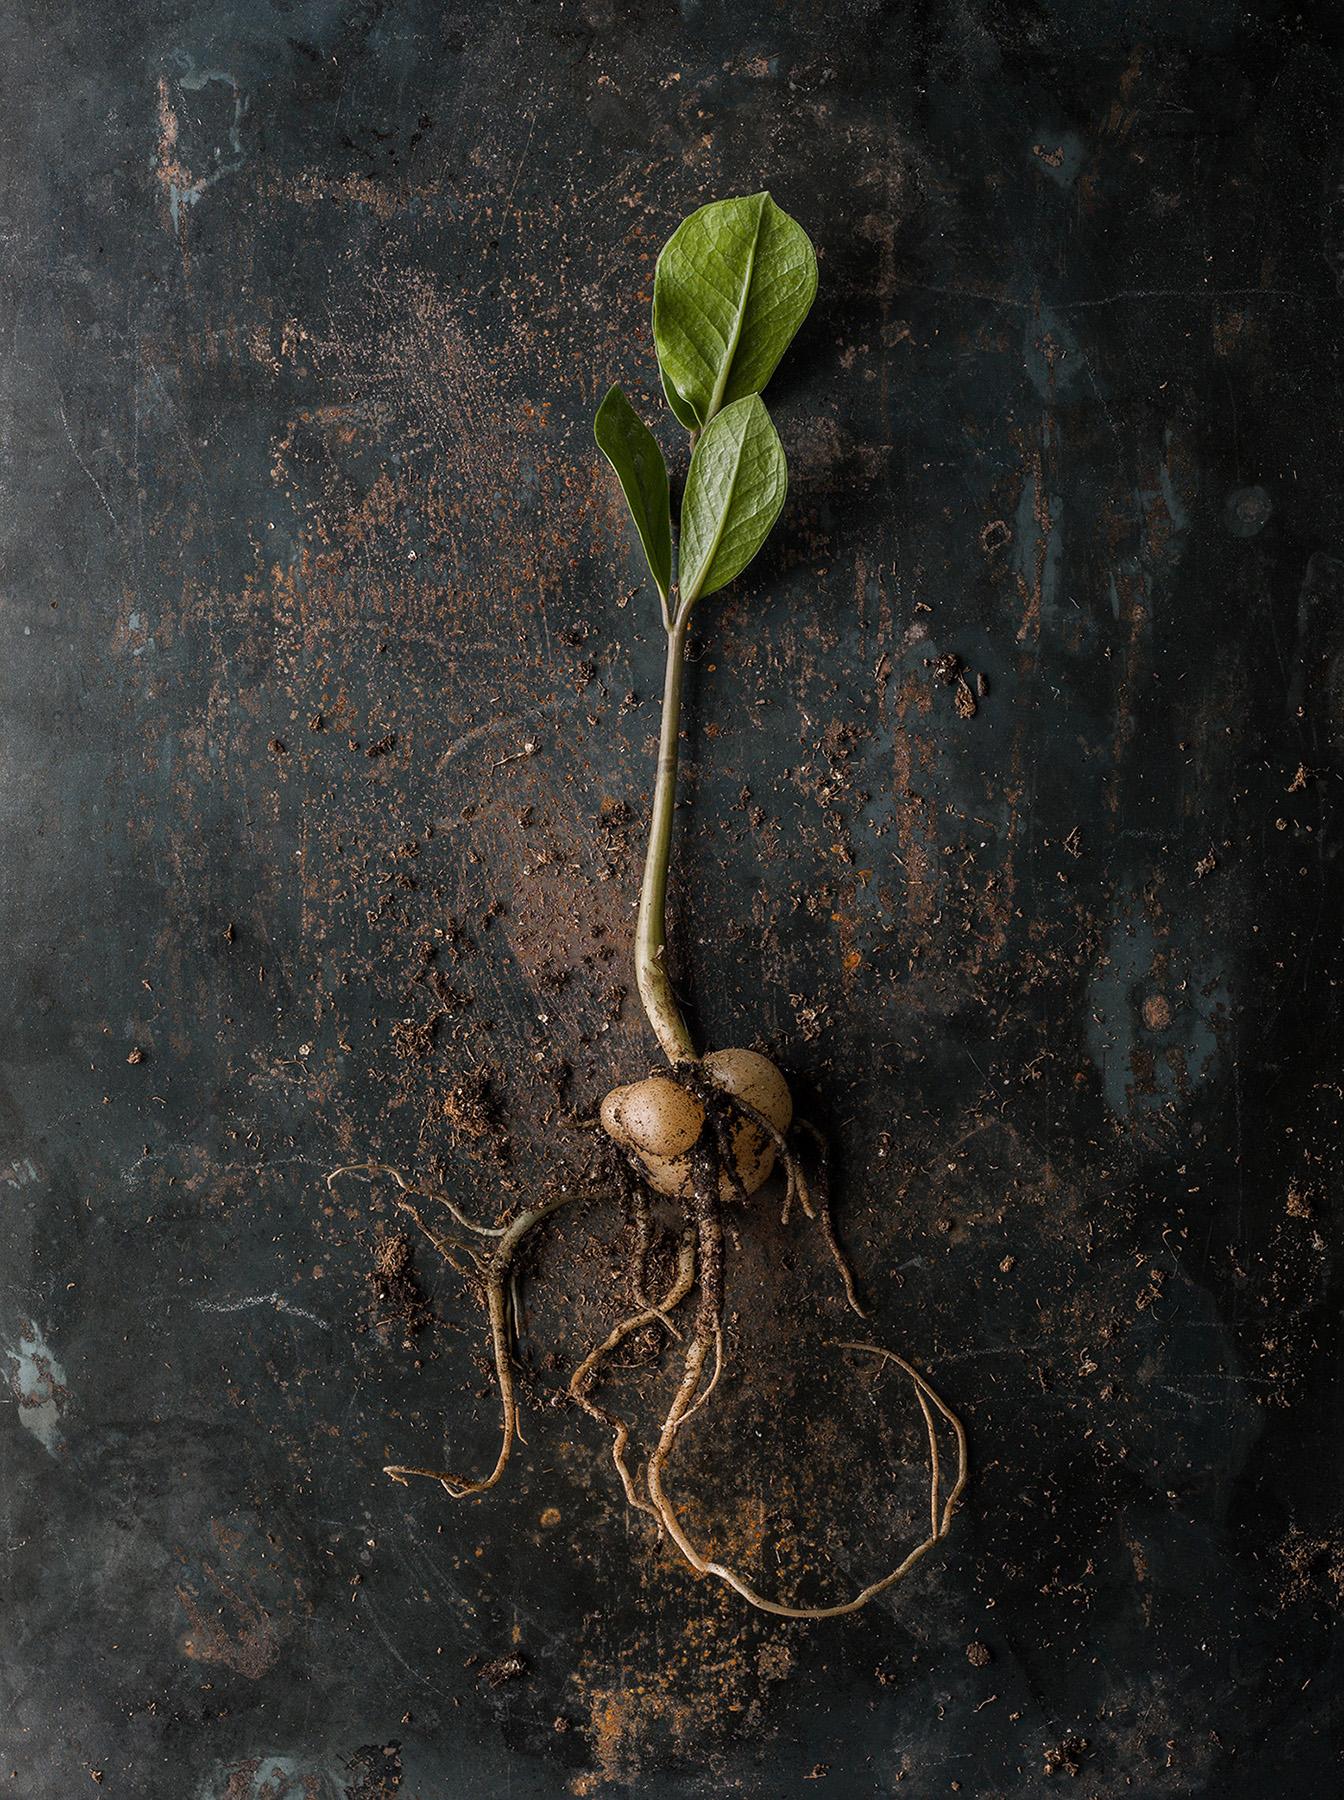 52_Beth_Galton_Roots_Zamioculcas_zamiifolia_4.jpg